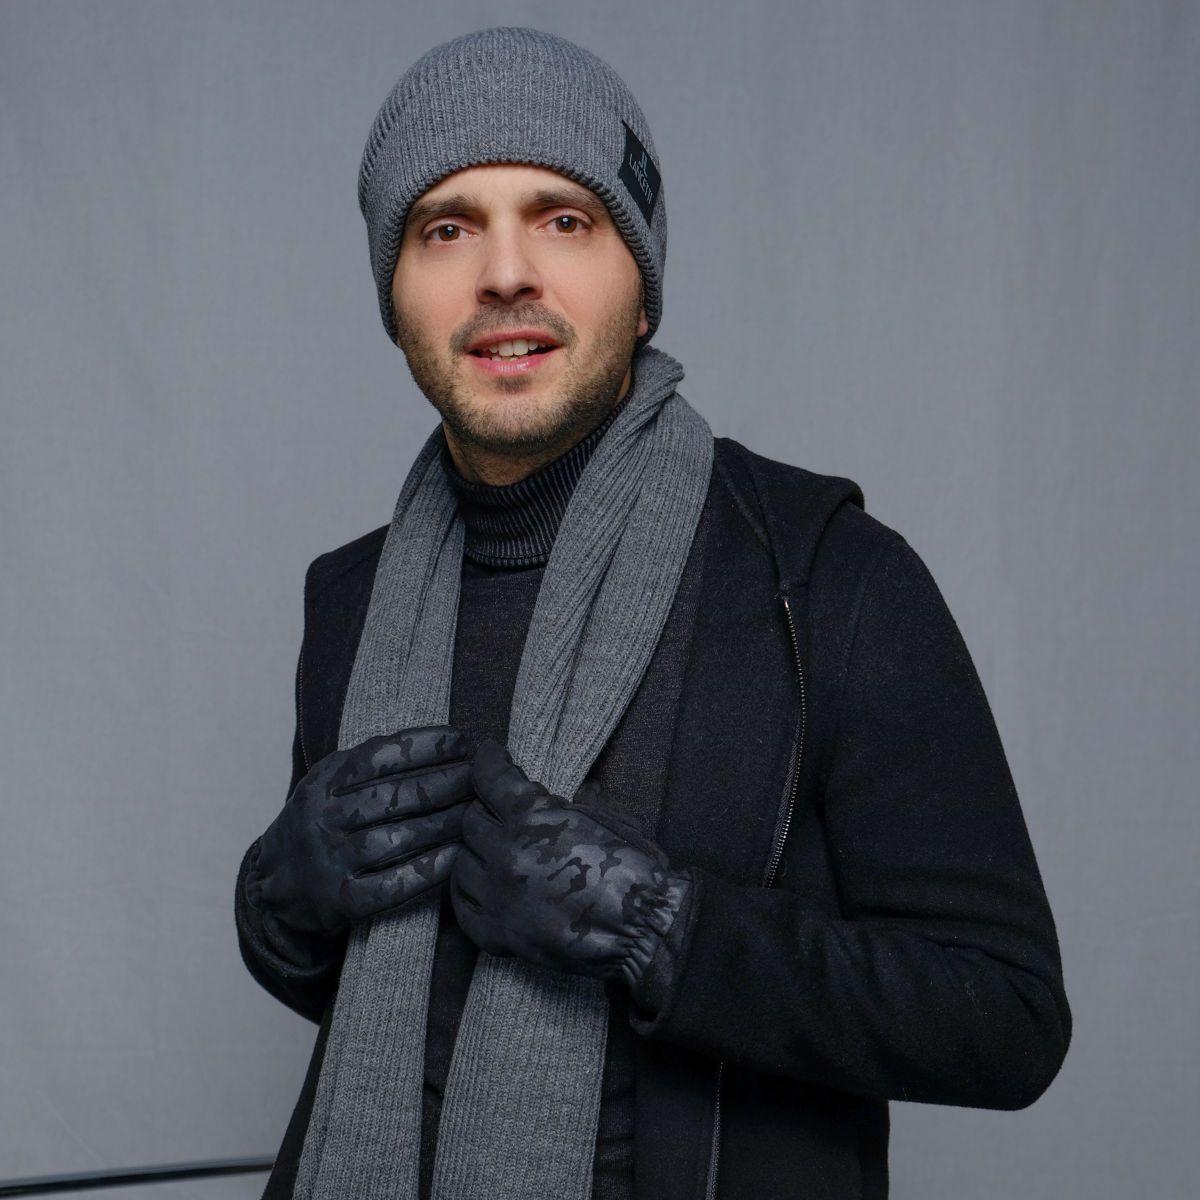 sciarpe, guanti e cappelli